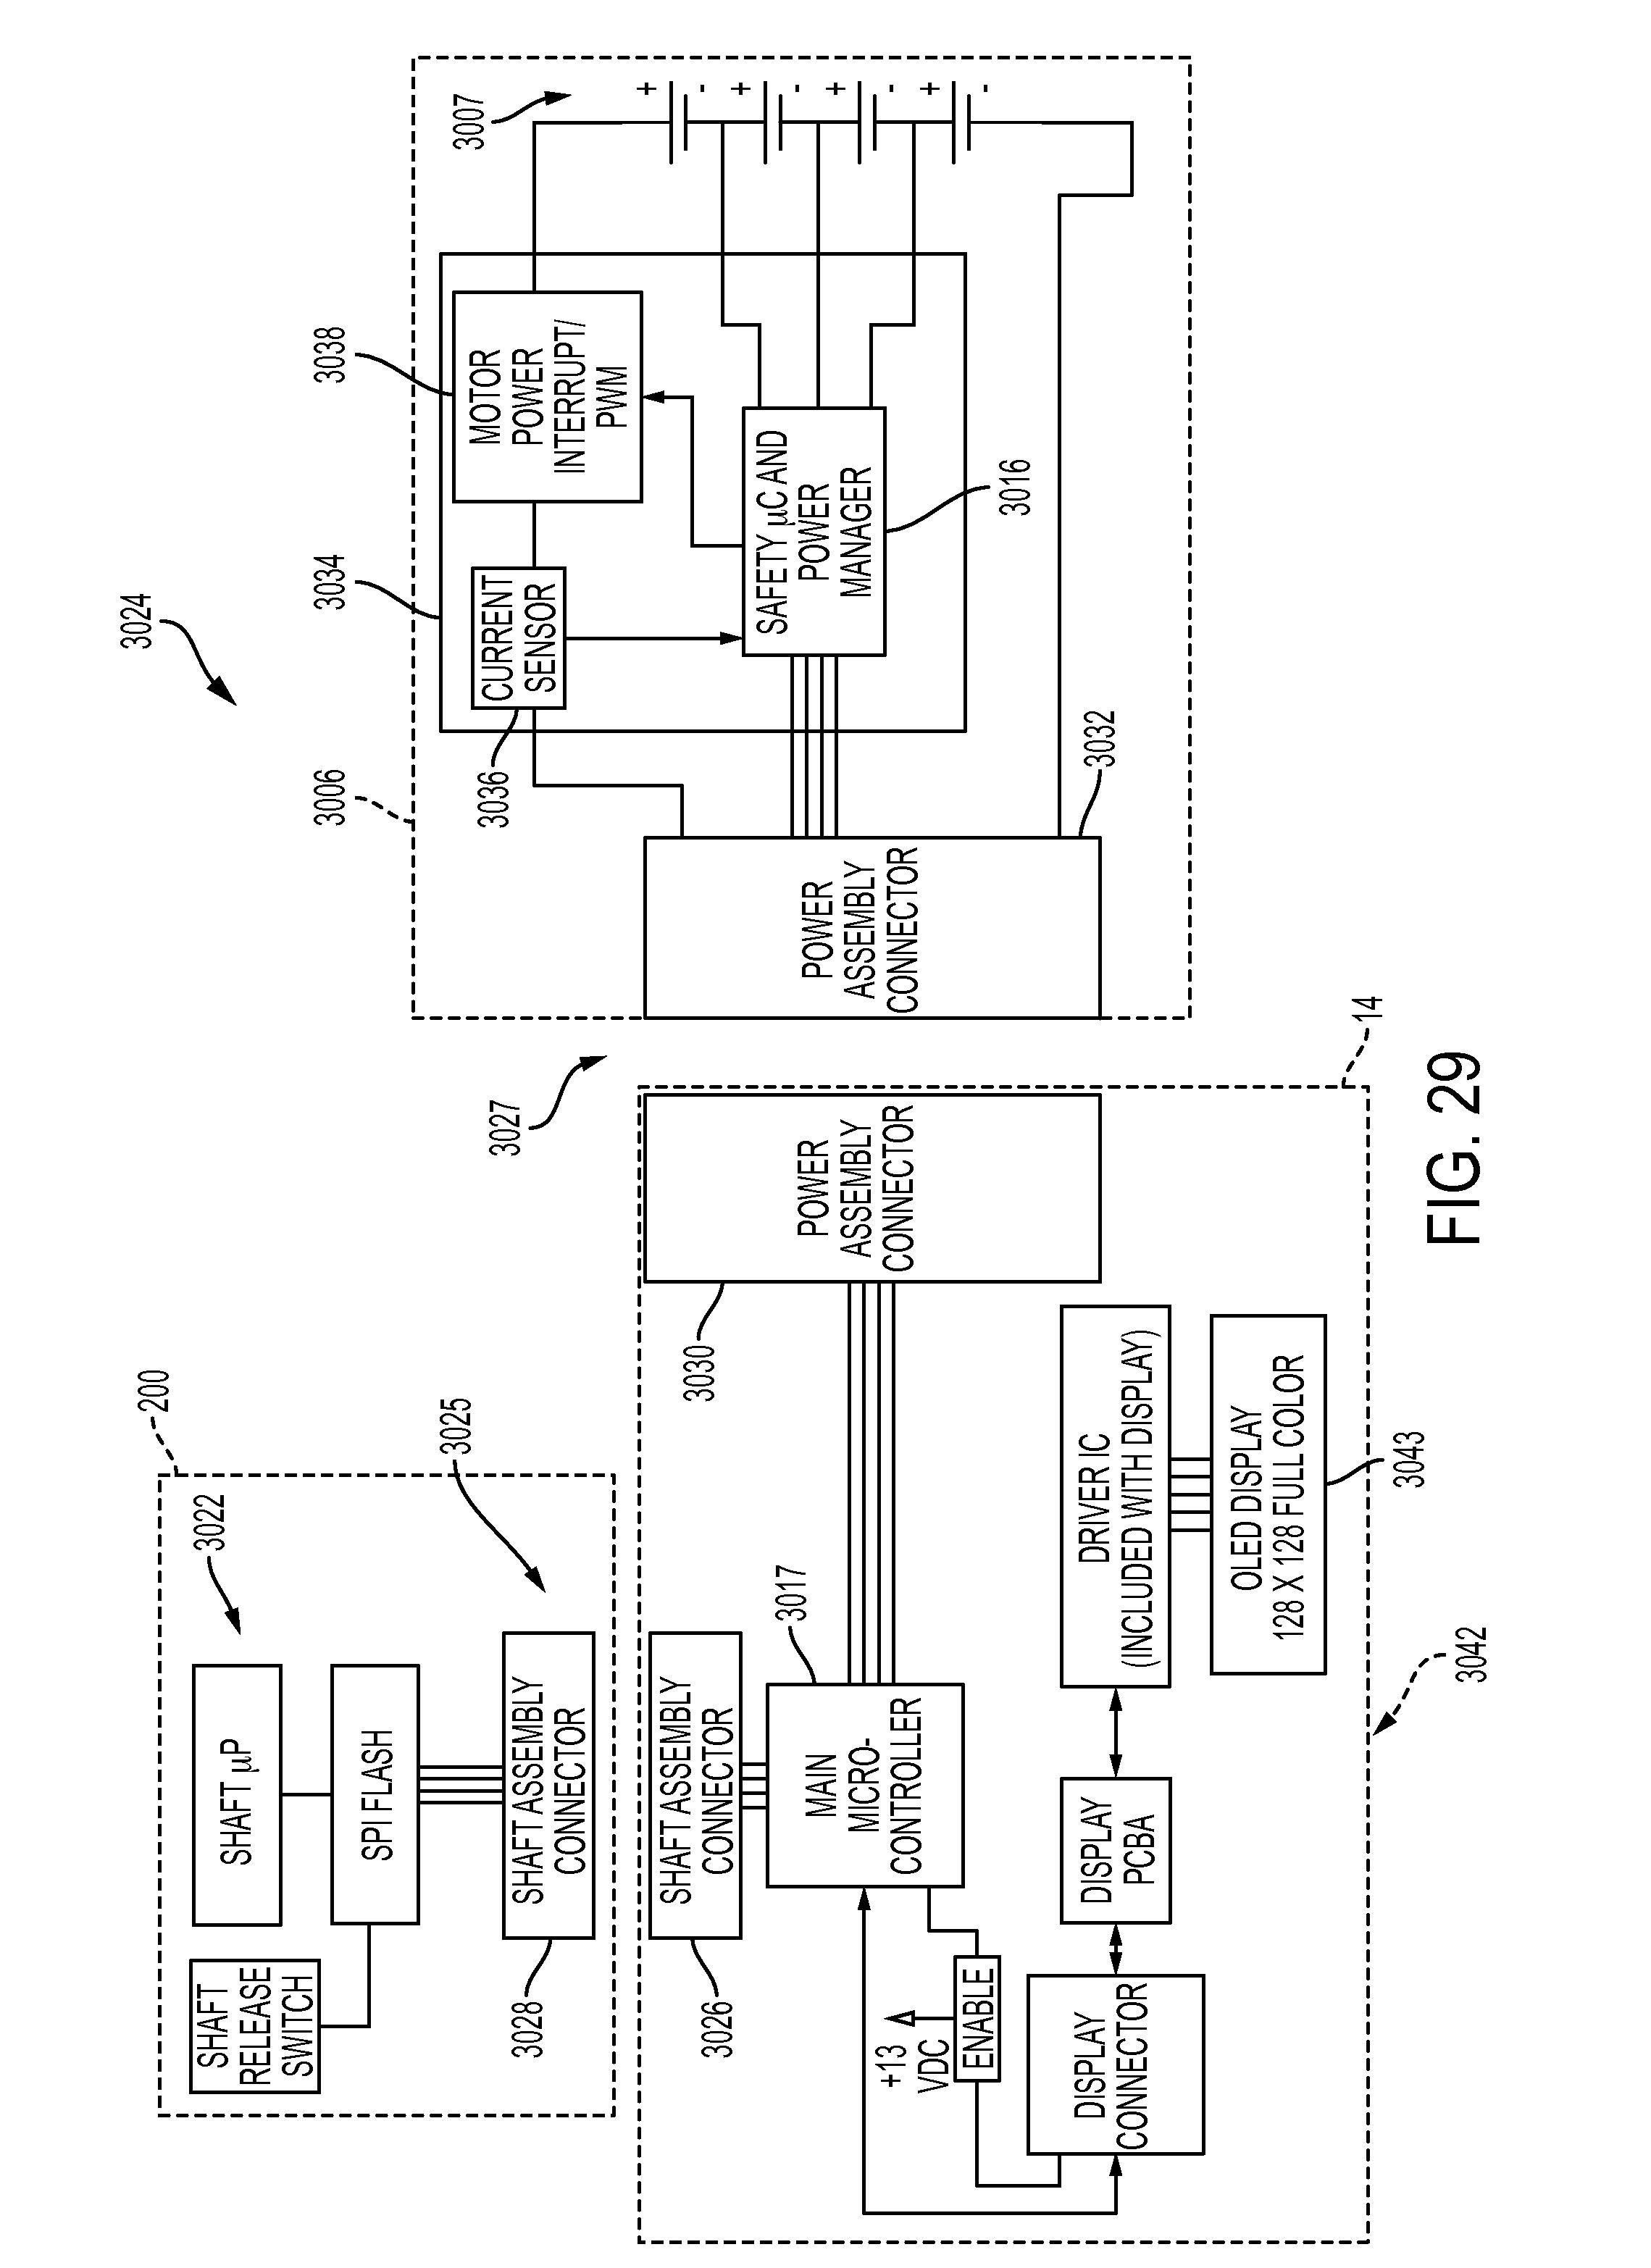 US10105139B2 - Surgical stapler having downstream current